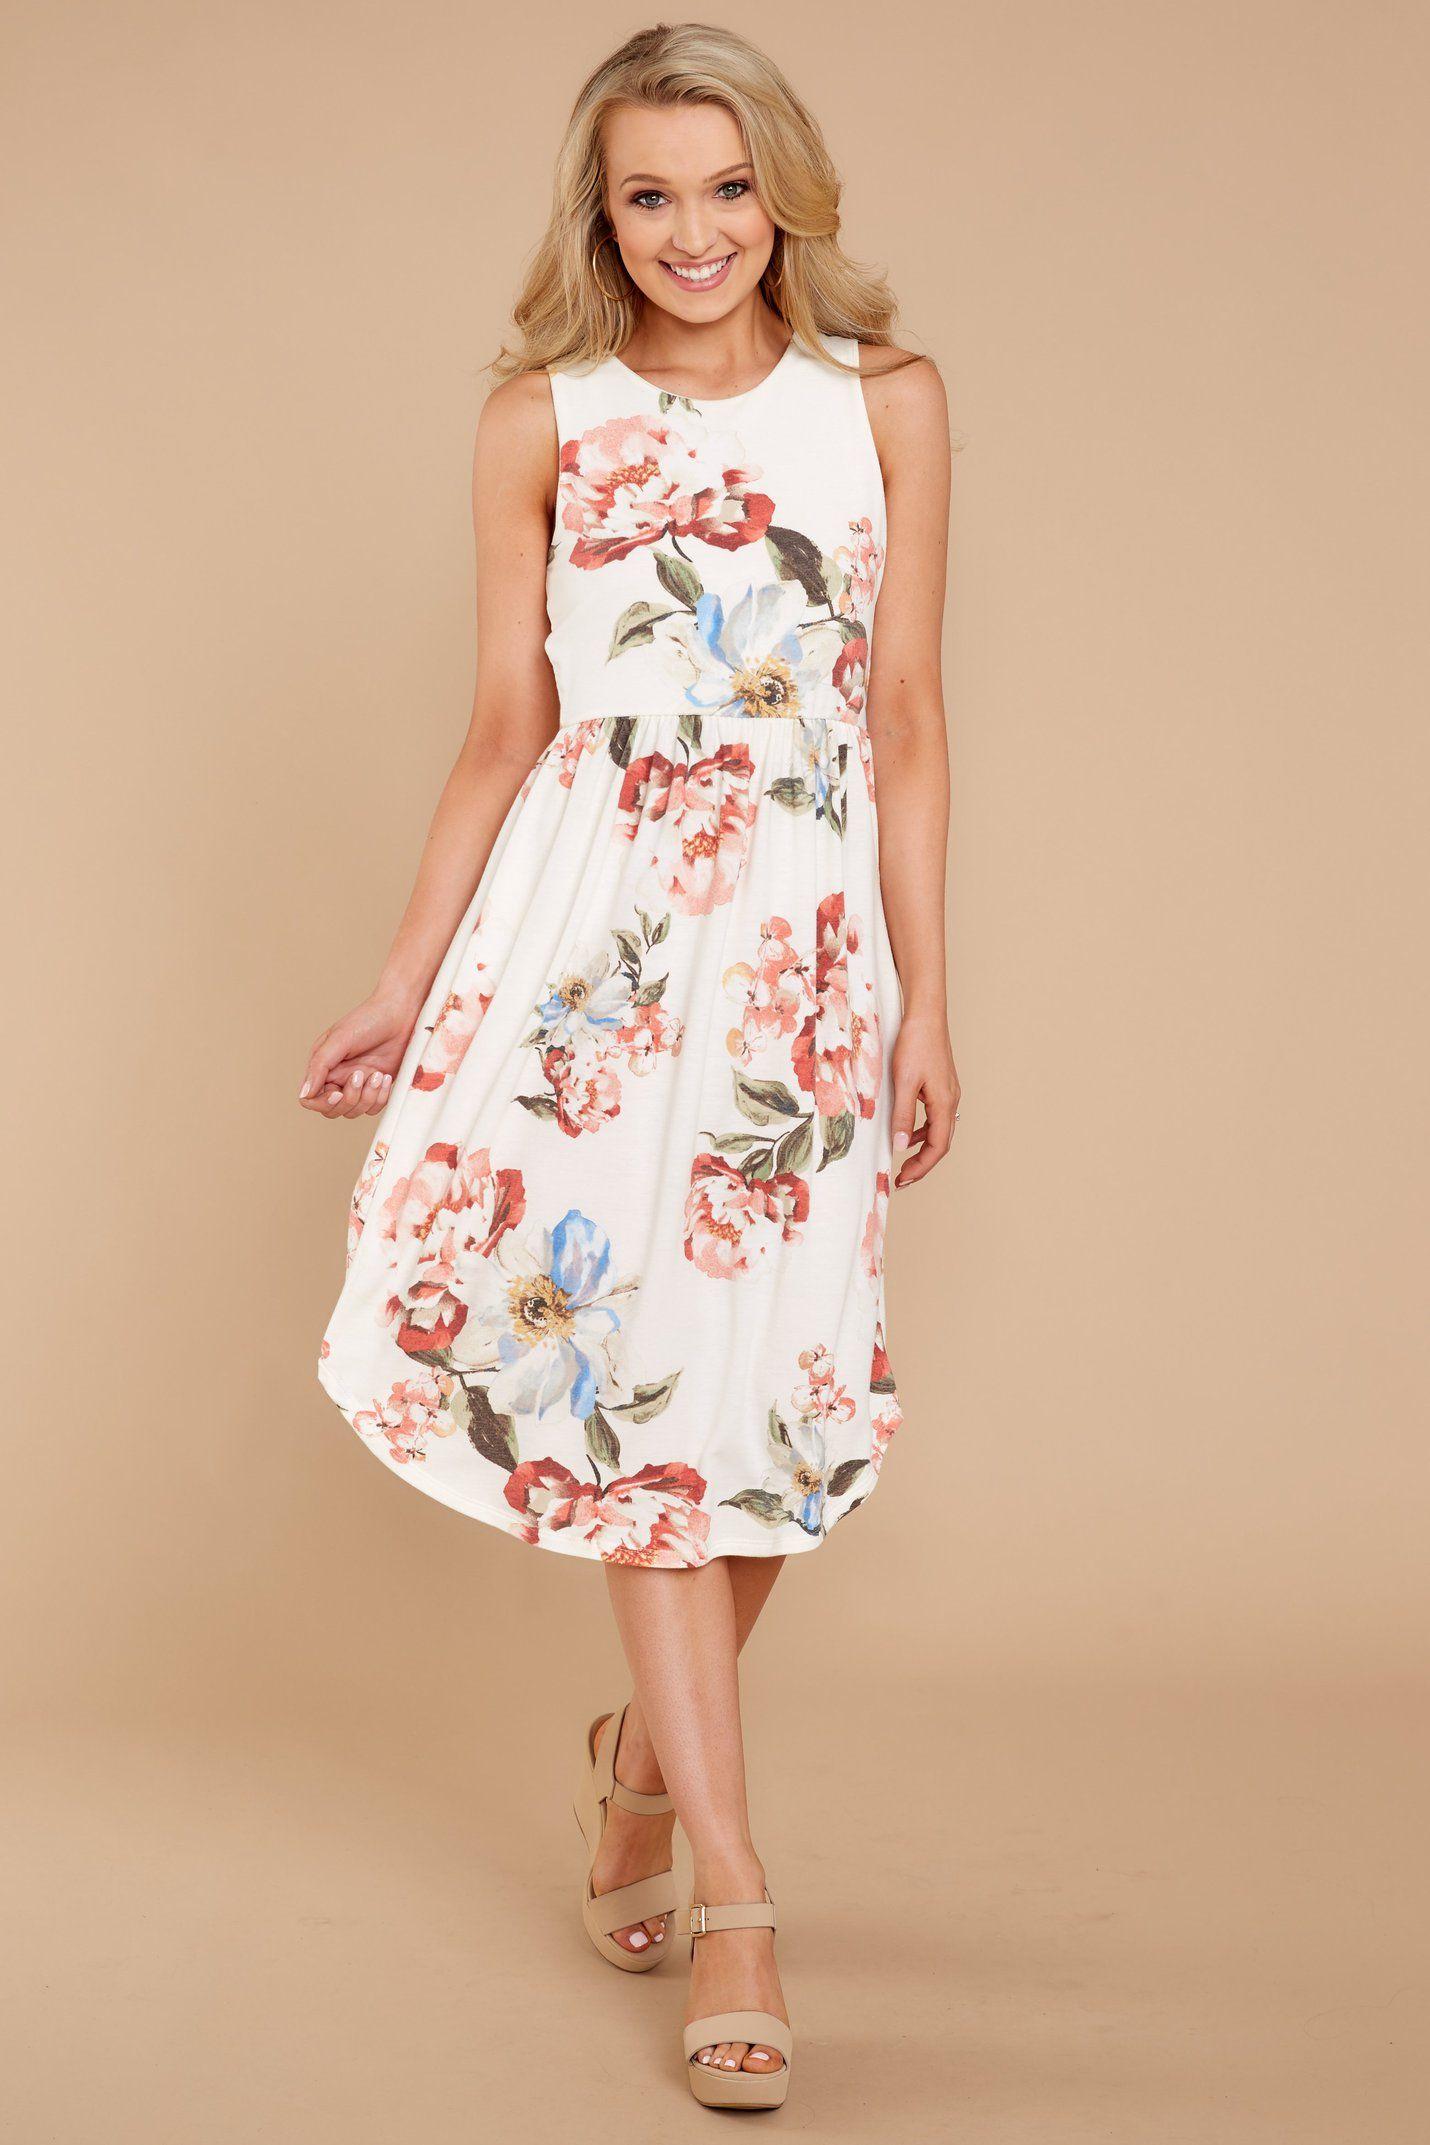 40 Cute Summer Sundresses Under 100 Pearls Prada Summer Dresses Sundresses Womens Floral Dress Sundress [ 2145 x 1430 Pixel ]